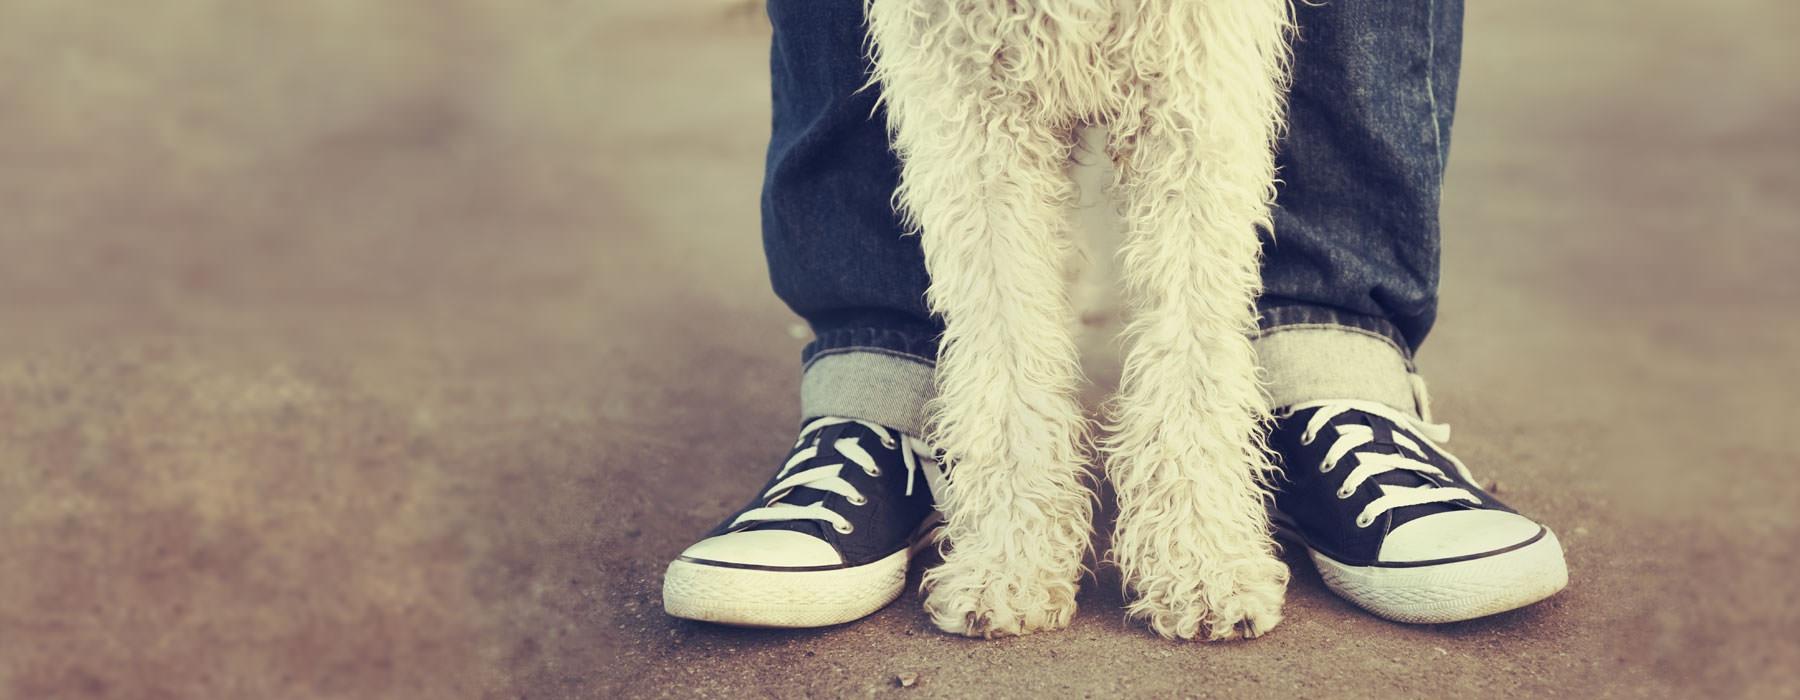 kids feet and dogs feet